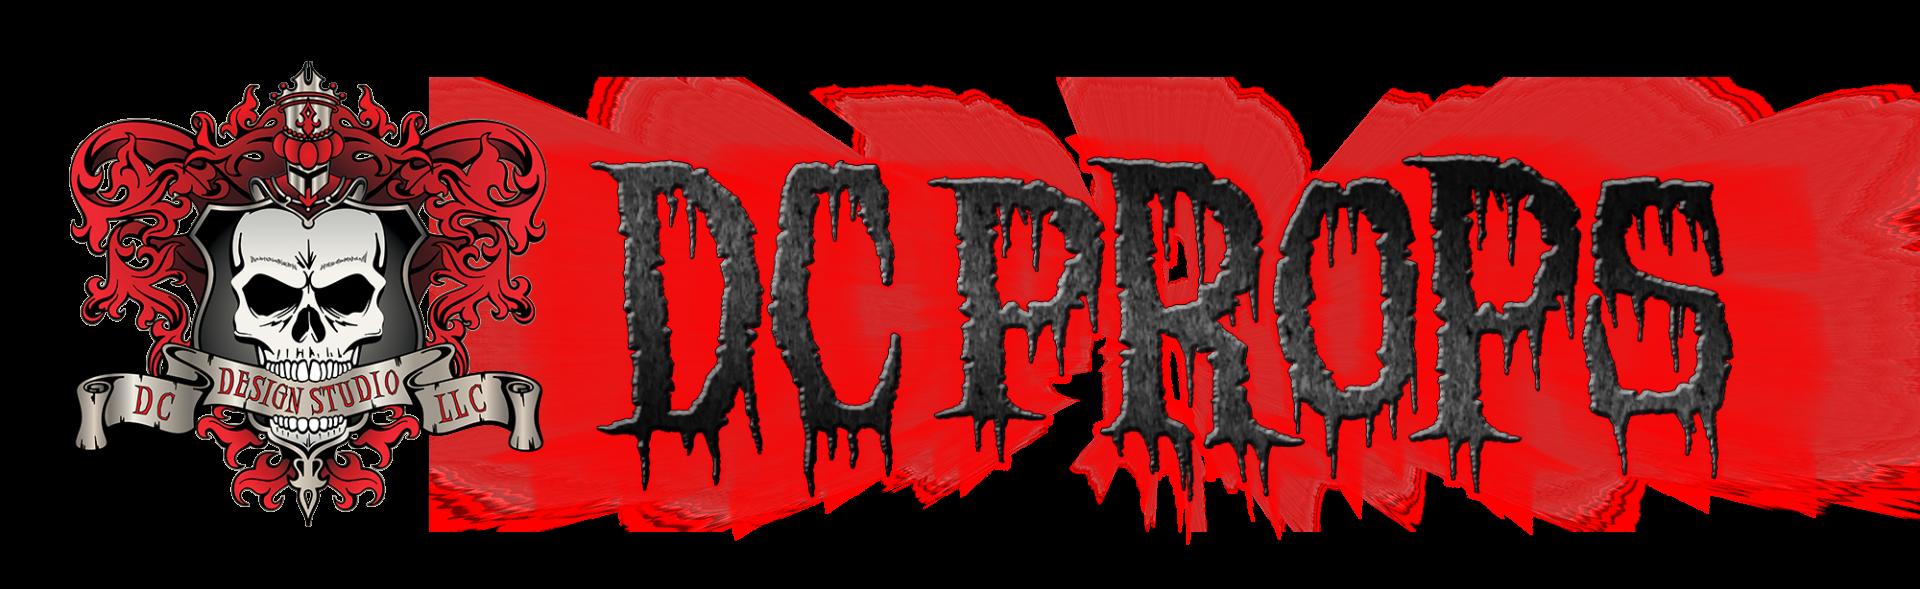 DC PROPS_header logo (4649e4dc-d55d-42a5-952a-4b3f452feca1)